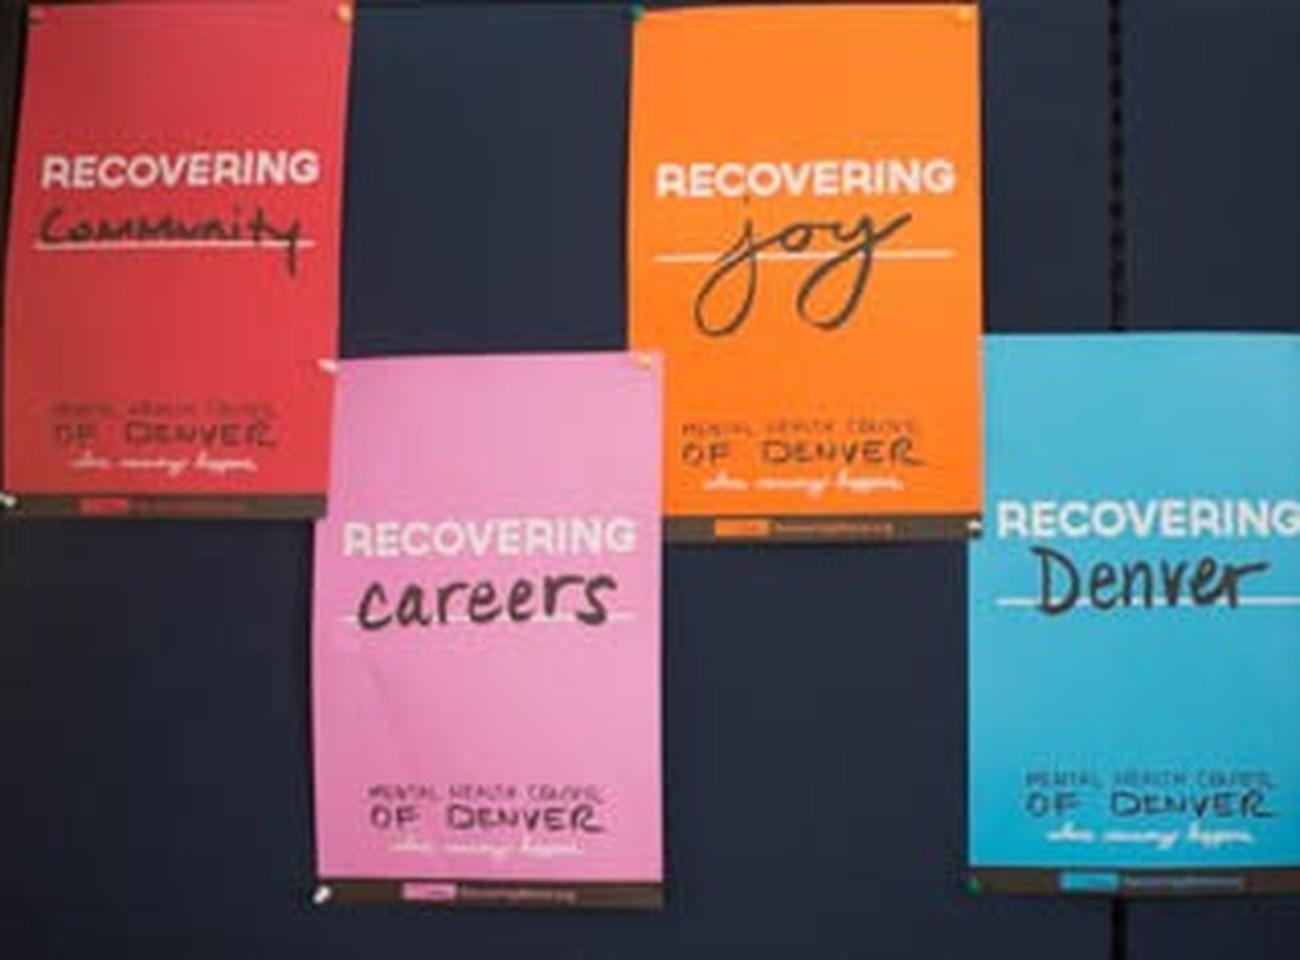 Mental Health Center of Denver Careers